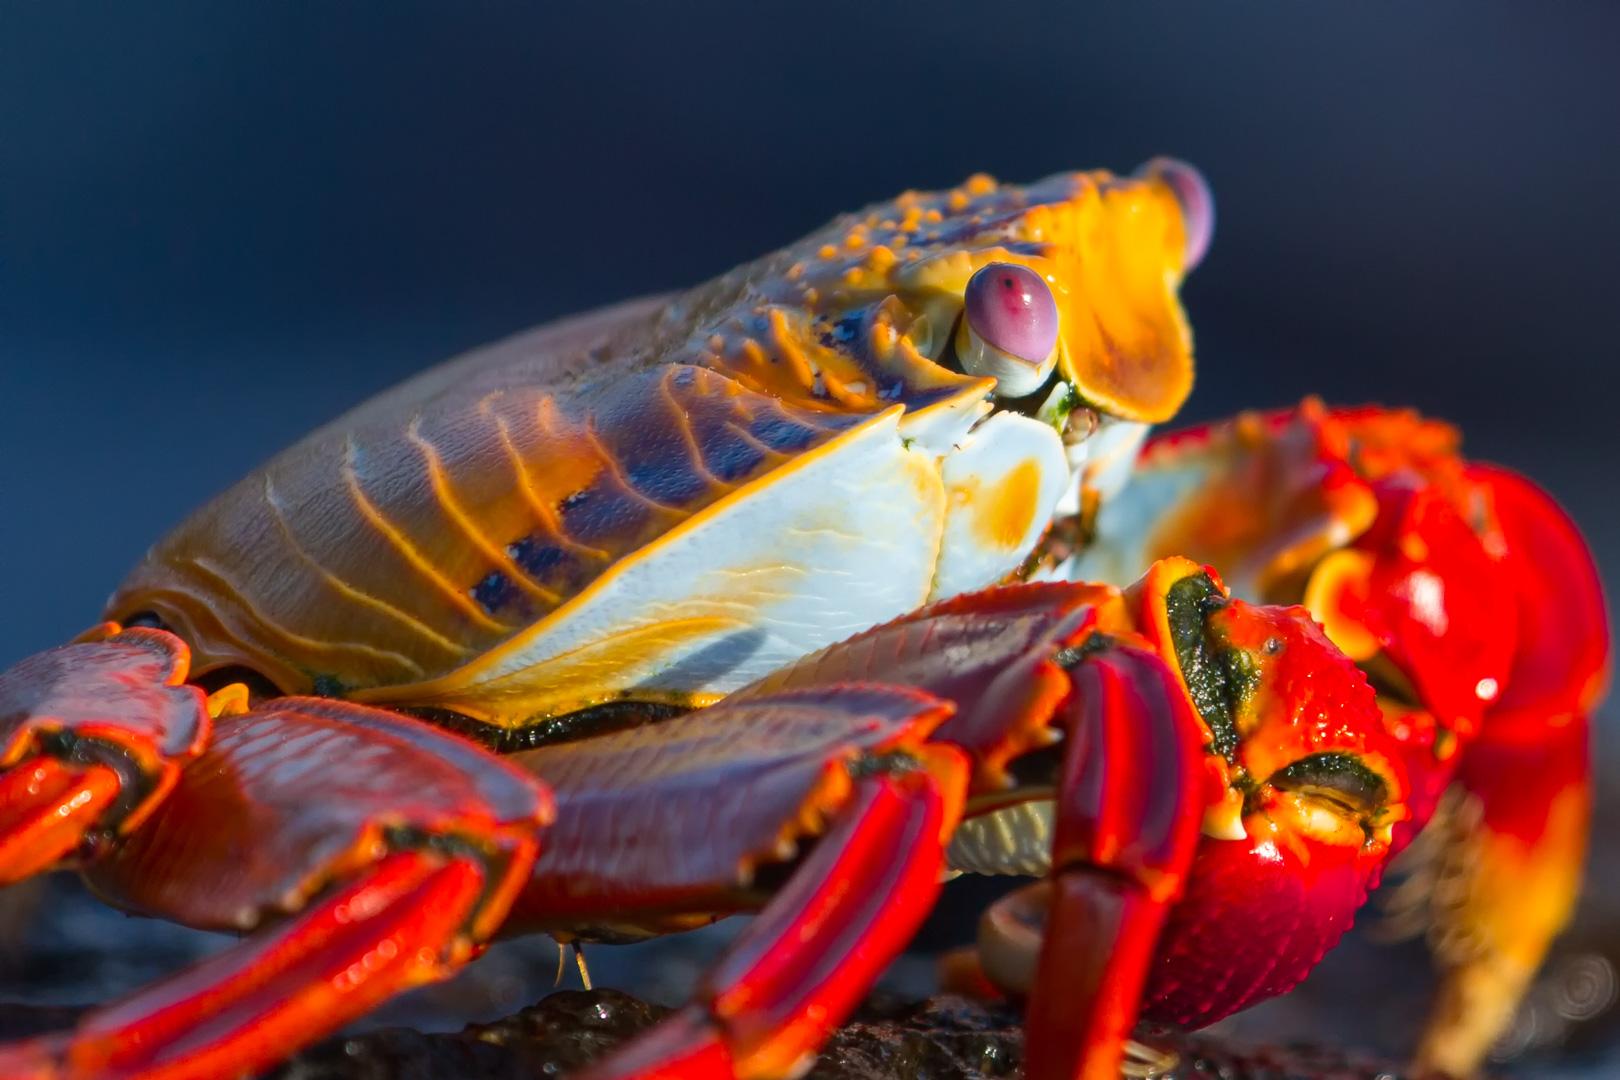 Galapagos Island - Sally Lightfoot Crab (Grapsus grapsus) - Canon EOS 5D III / EF 70-200mm  f/2,8 L IS II USM +2.0x III